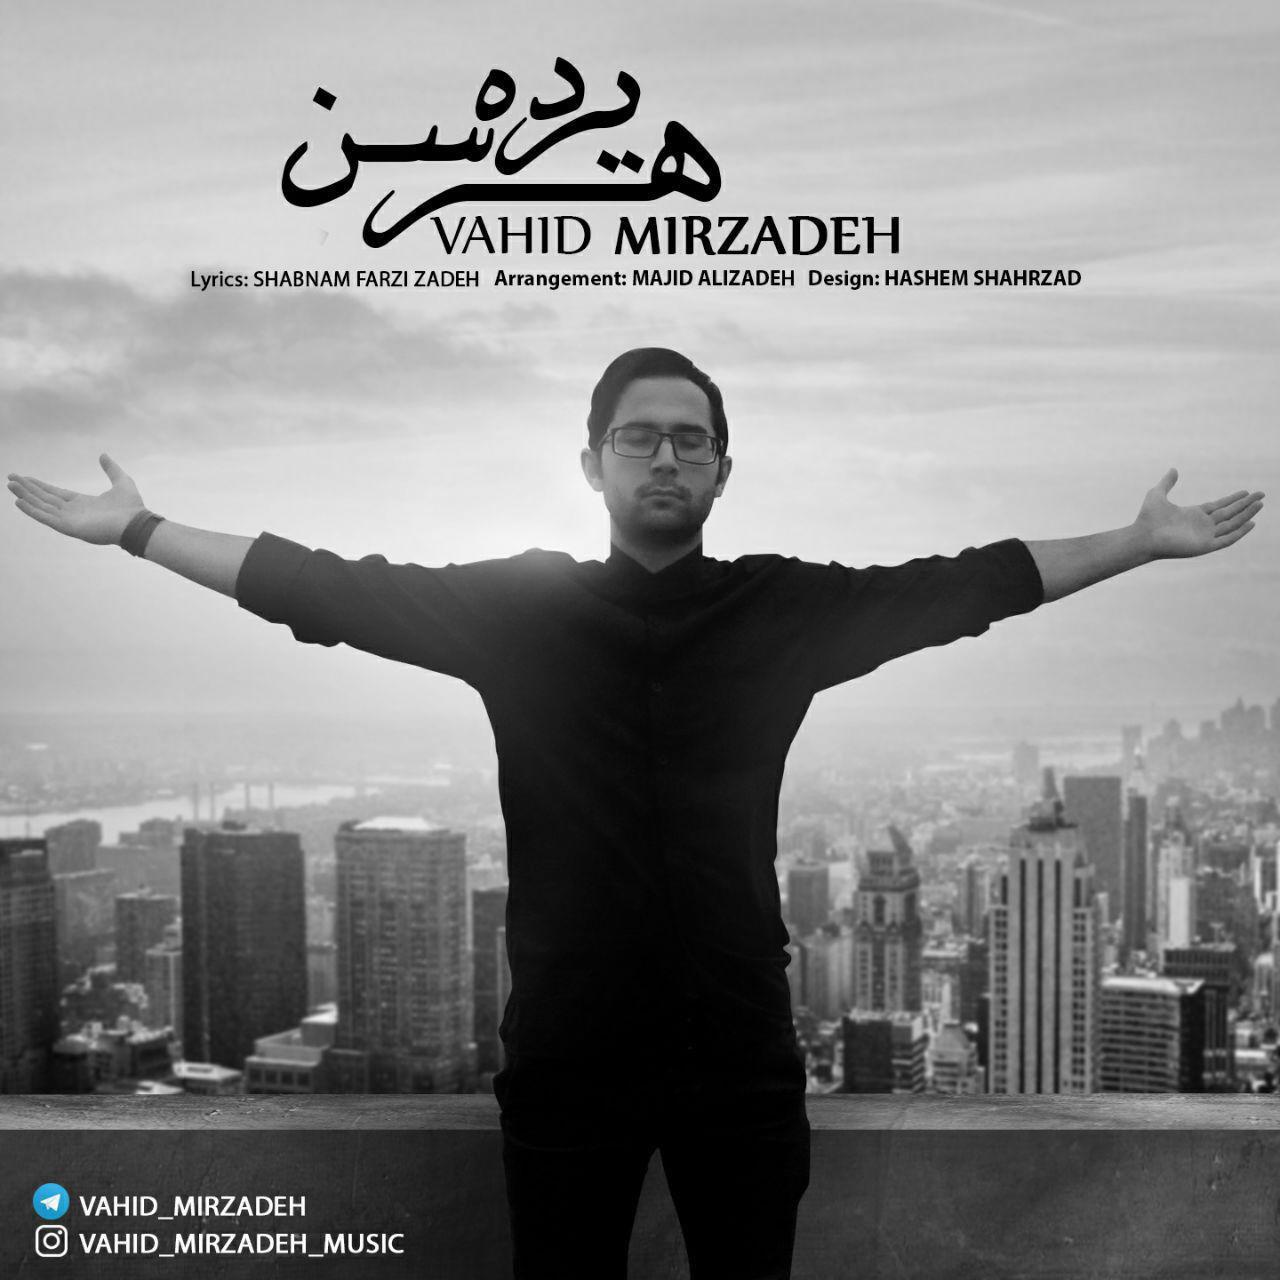 http://s9.picofile.com/file/8305280000/2Vahid_Mirzadeh_Har_Yerda_San.jpg